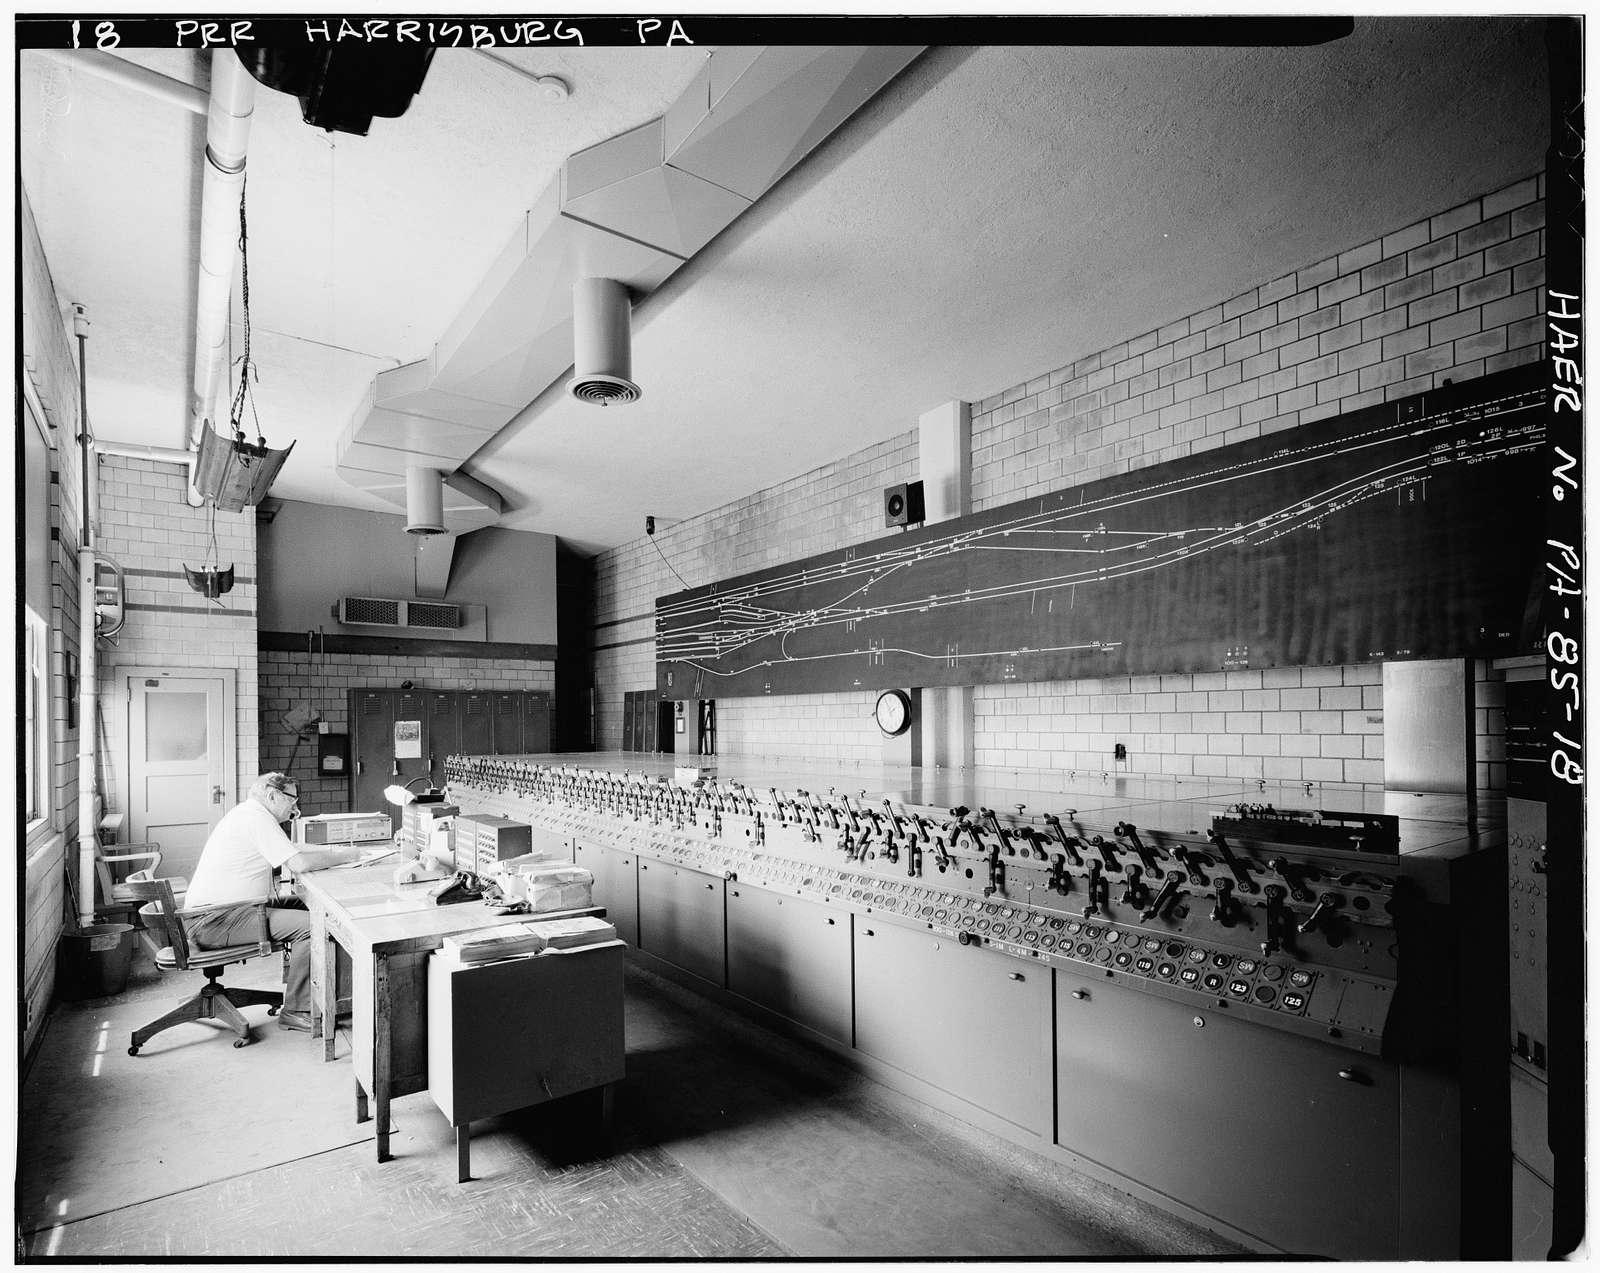 Pennsylvania Railroad, Harrisburg Station & Trainshed, Market & South Fourth Streets, Harrisburg, Dauphin County, PA